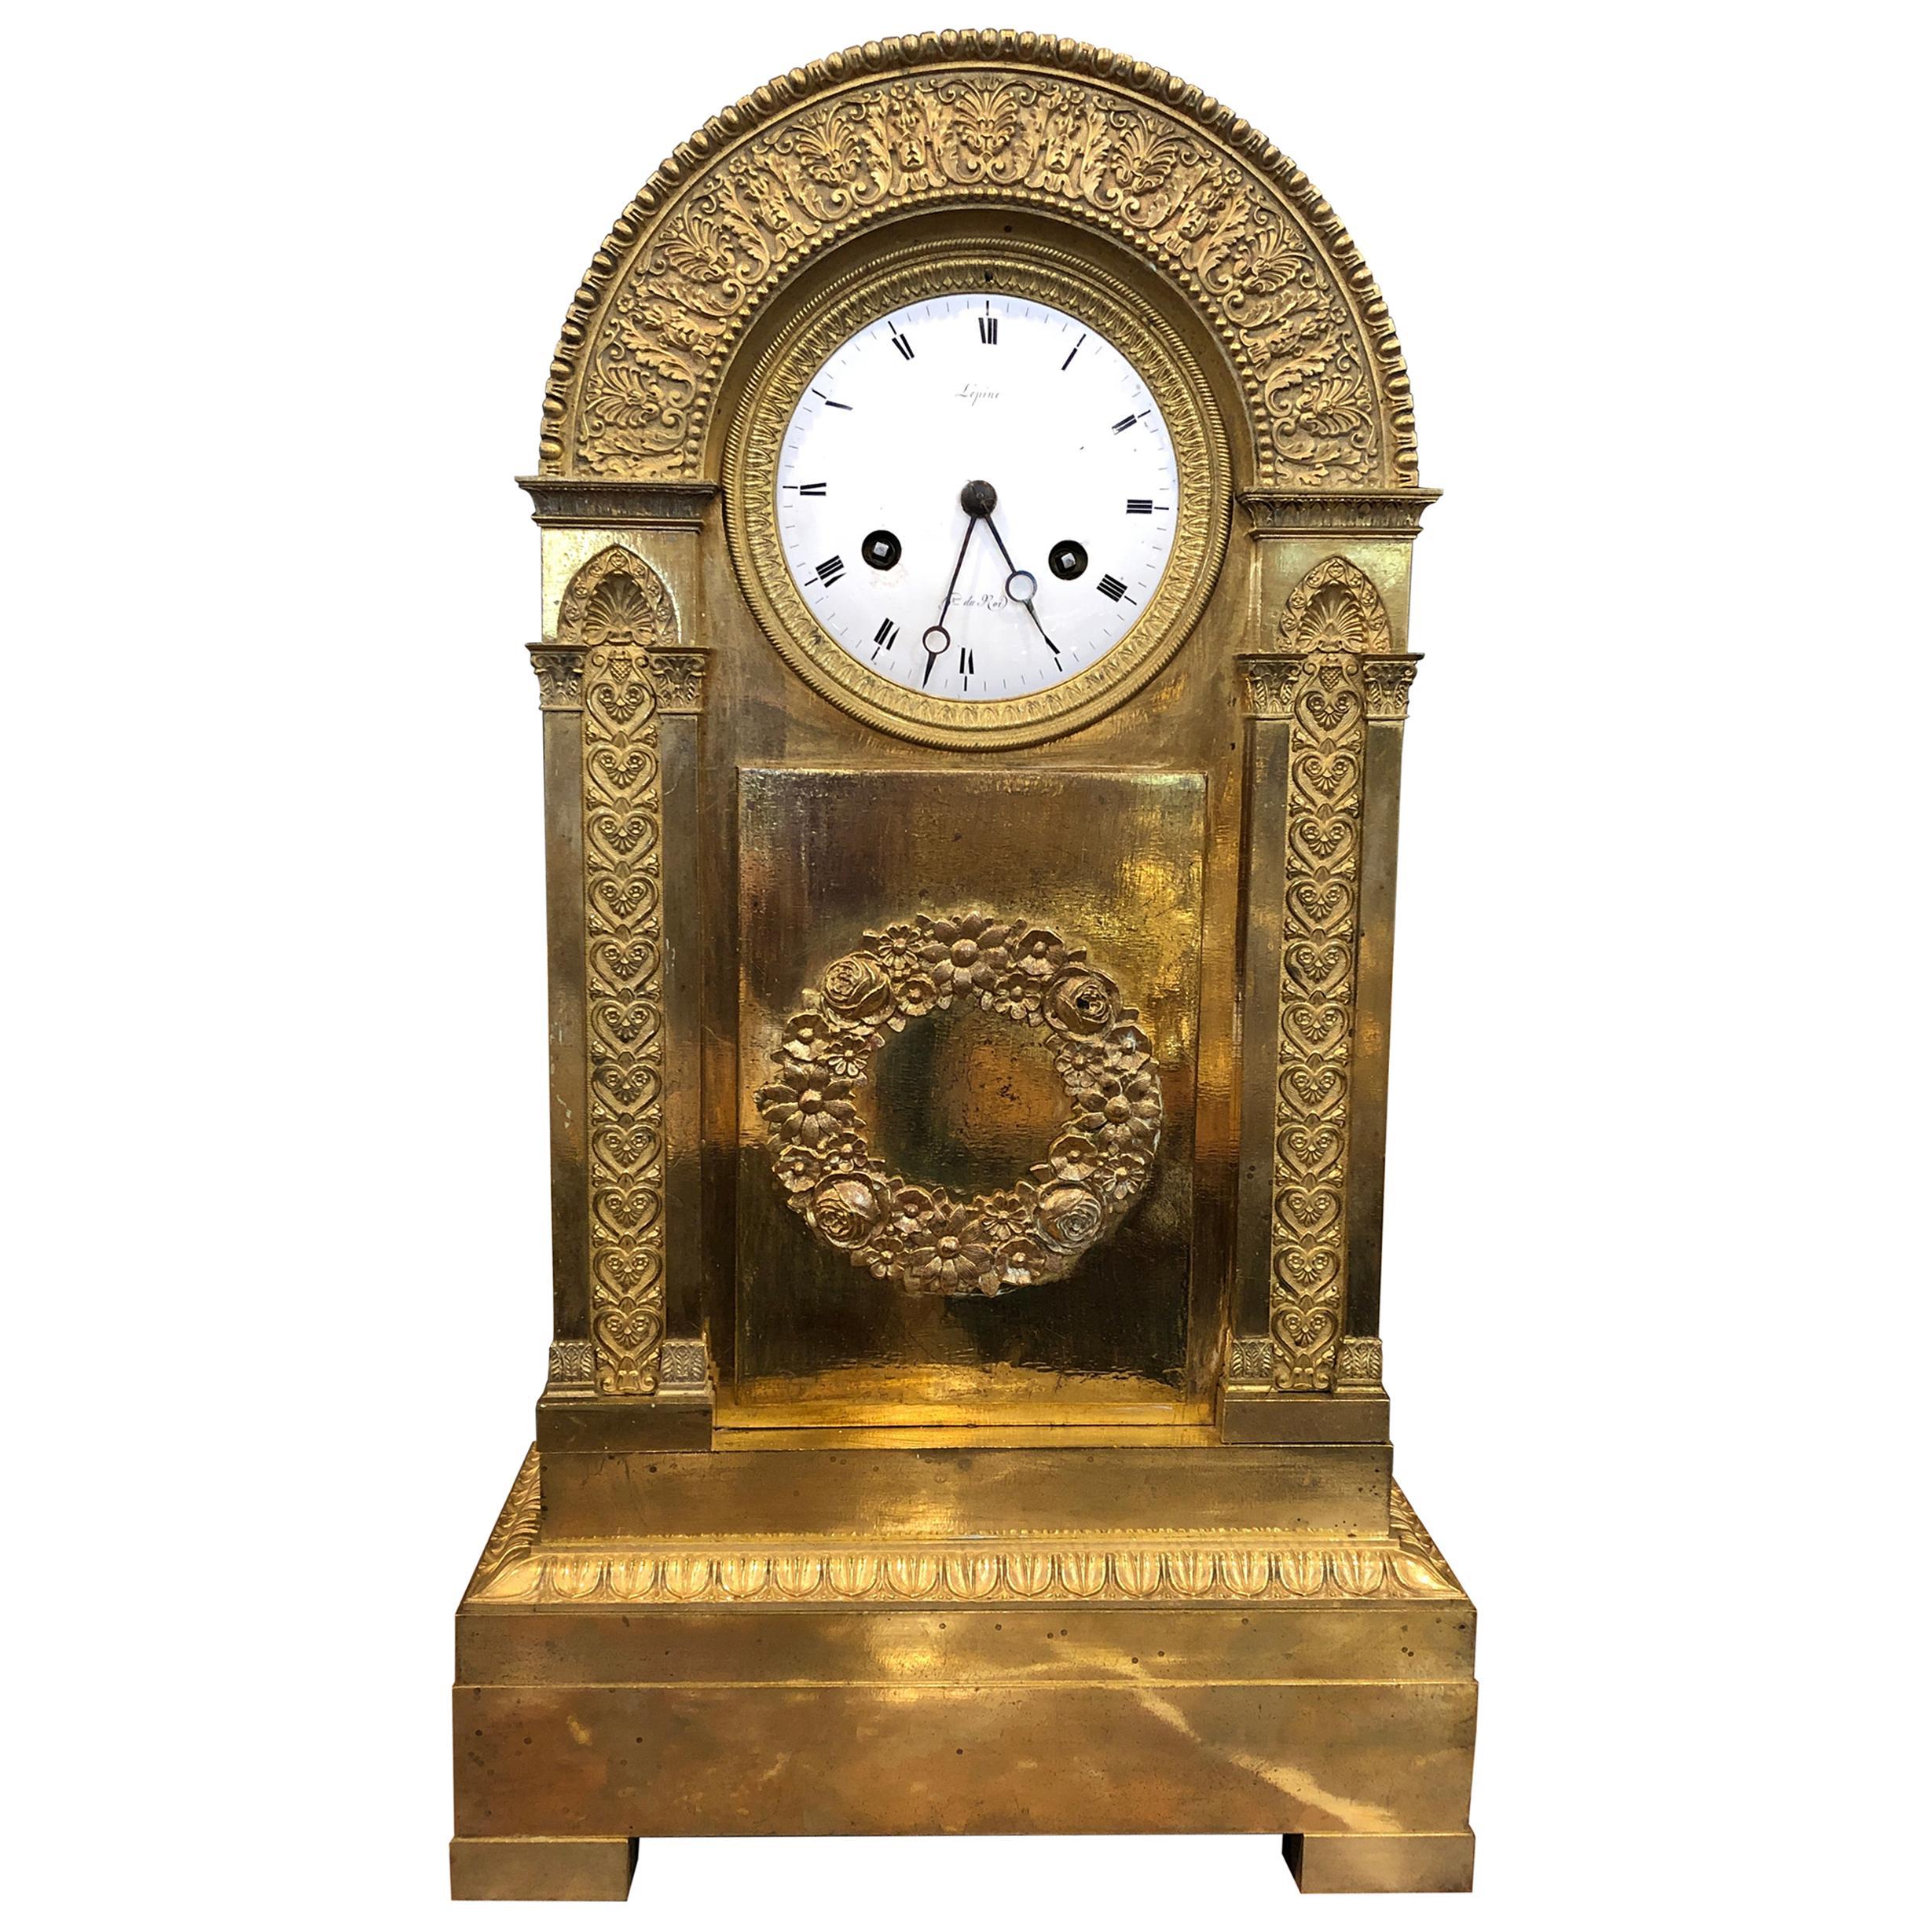 18th Century France Louis XVI Gilt Mantel Clock by Lepine, 1790s